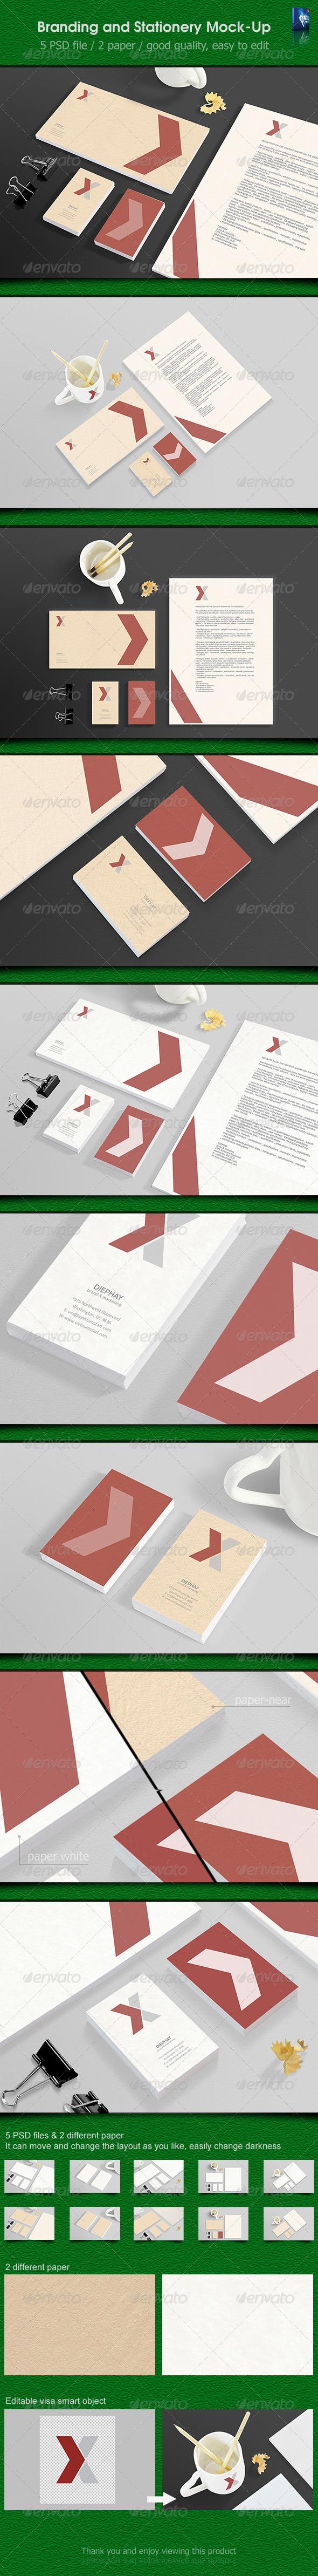 GraphicRiver Stationery Mockups 6255079